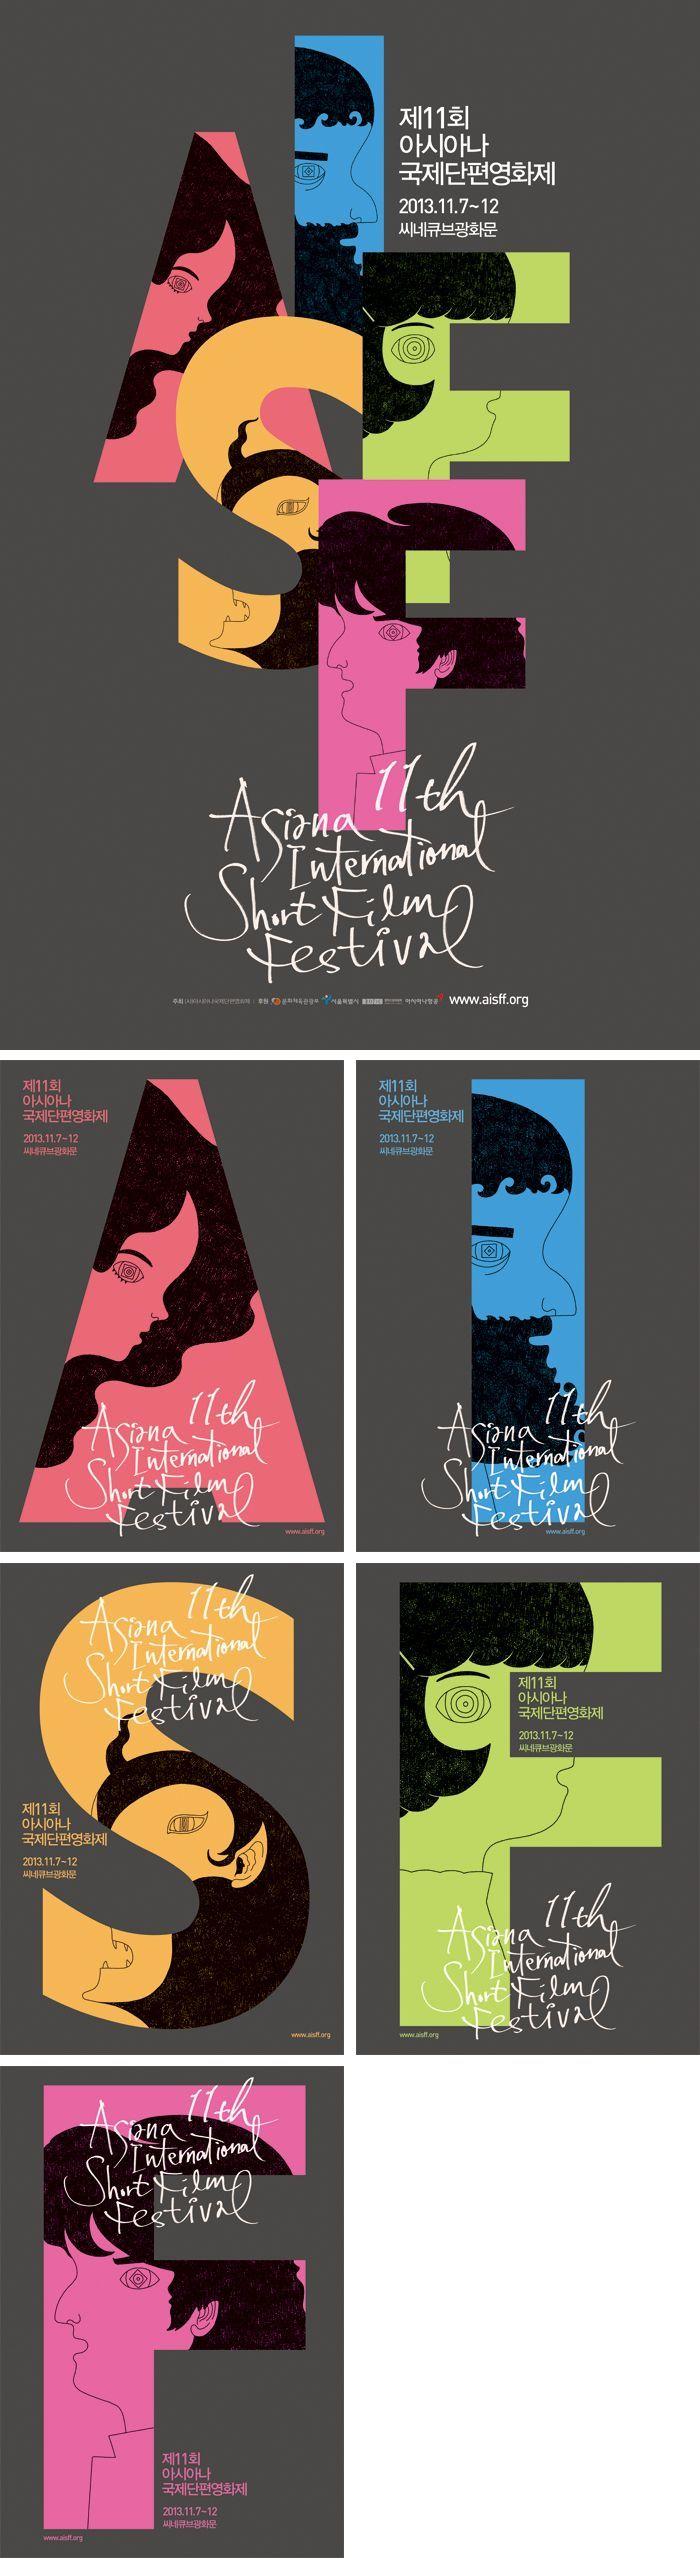 Printed Matter :: alternative graphics - PROPAGANDA :: - 제11회 아시아나국제단편영화제